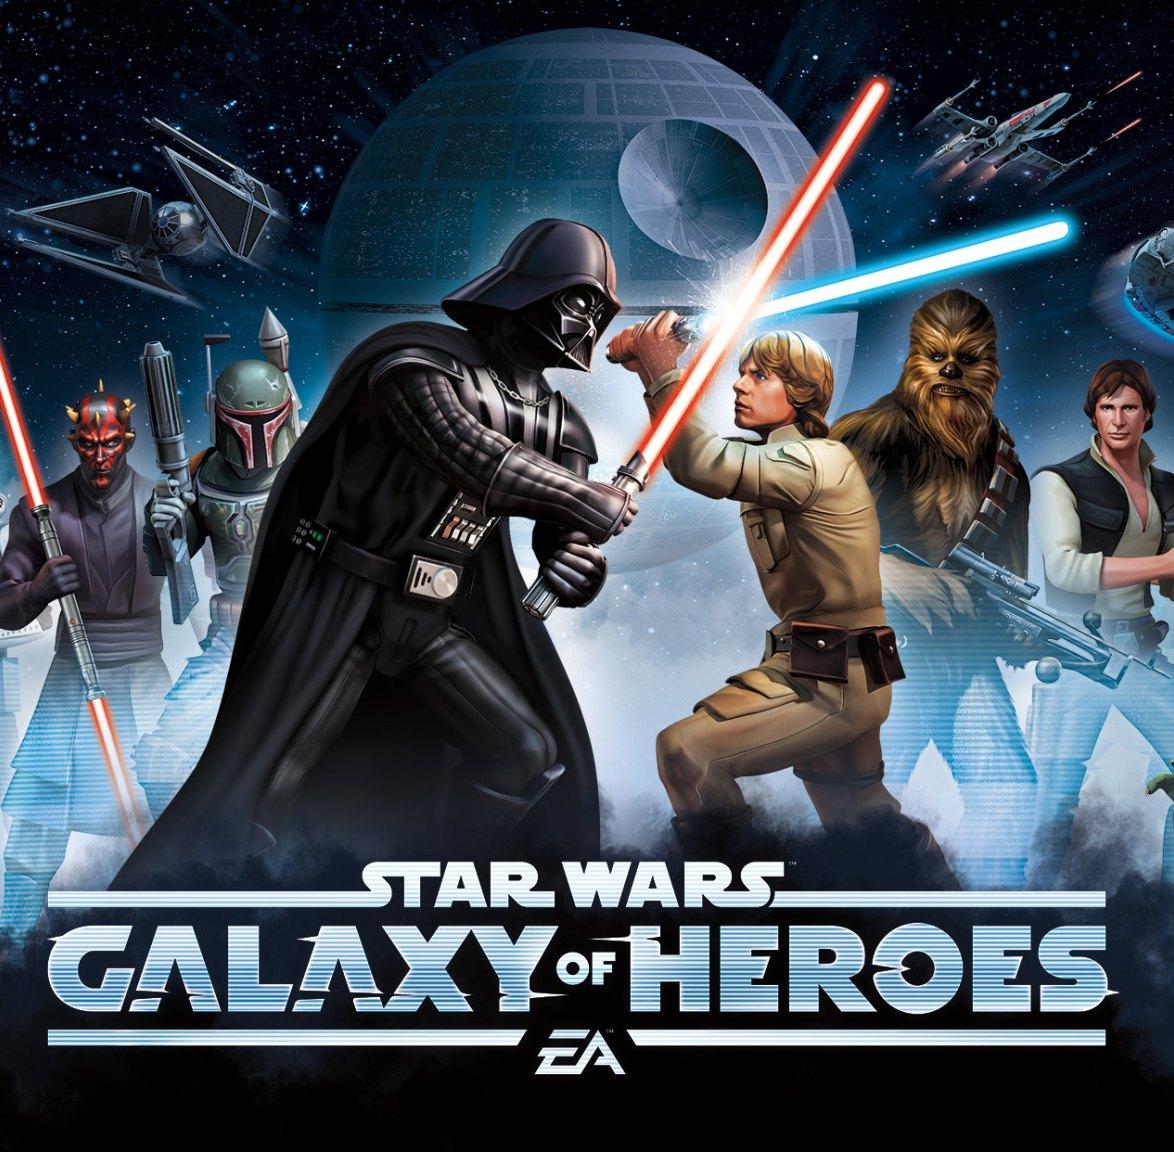 Star Wars : Les Héros de la galaxie